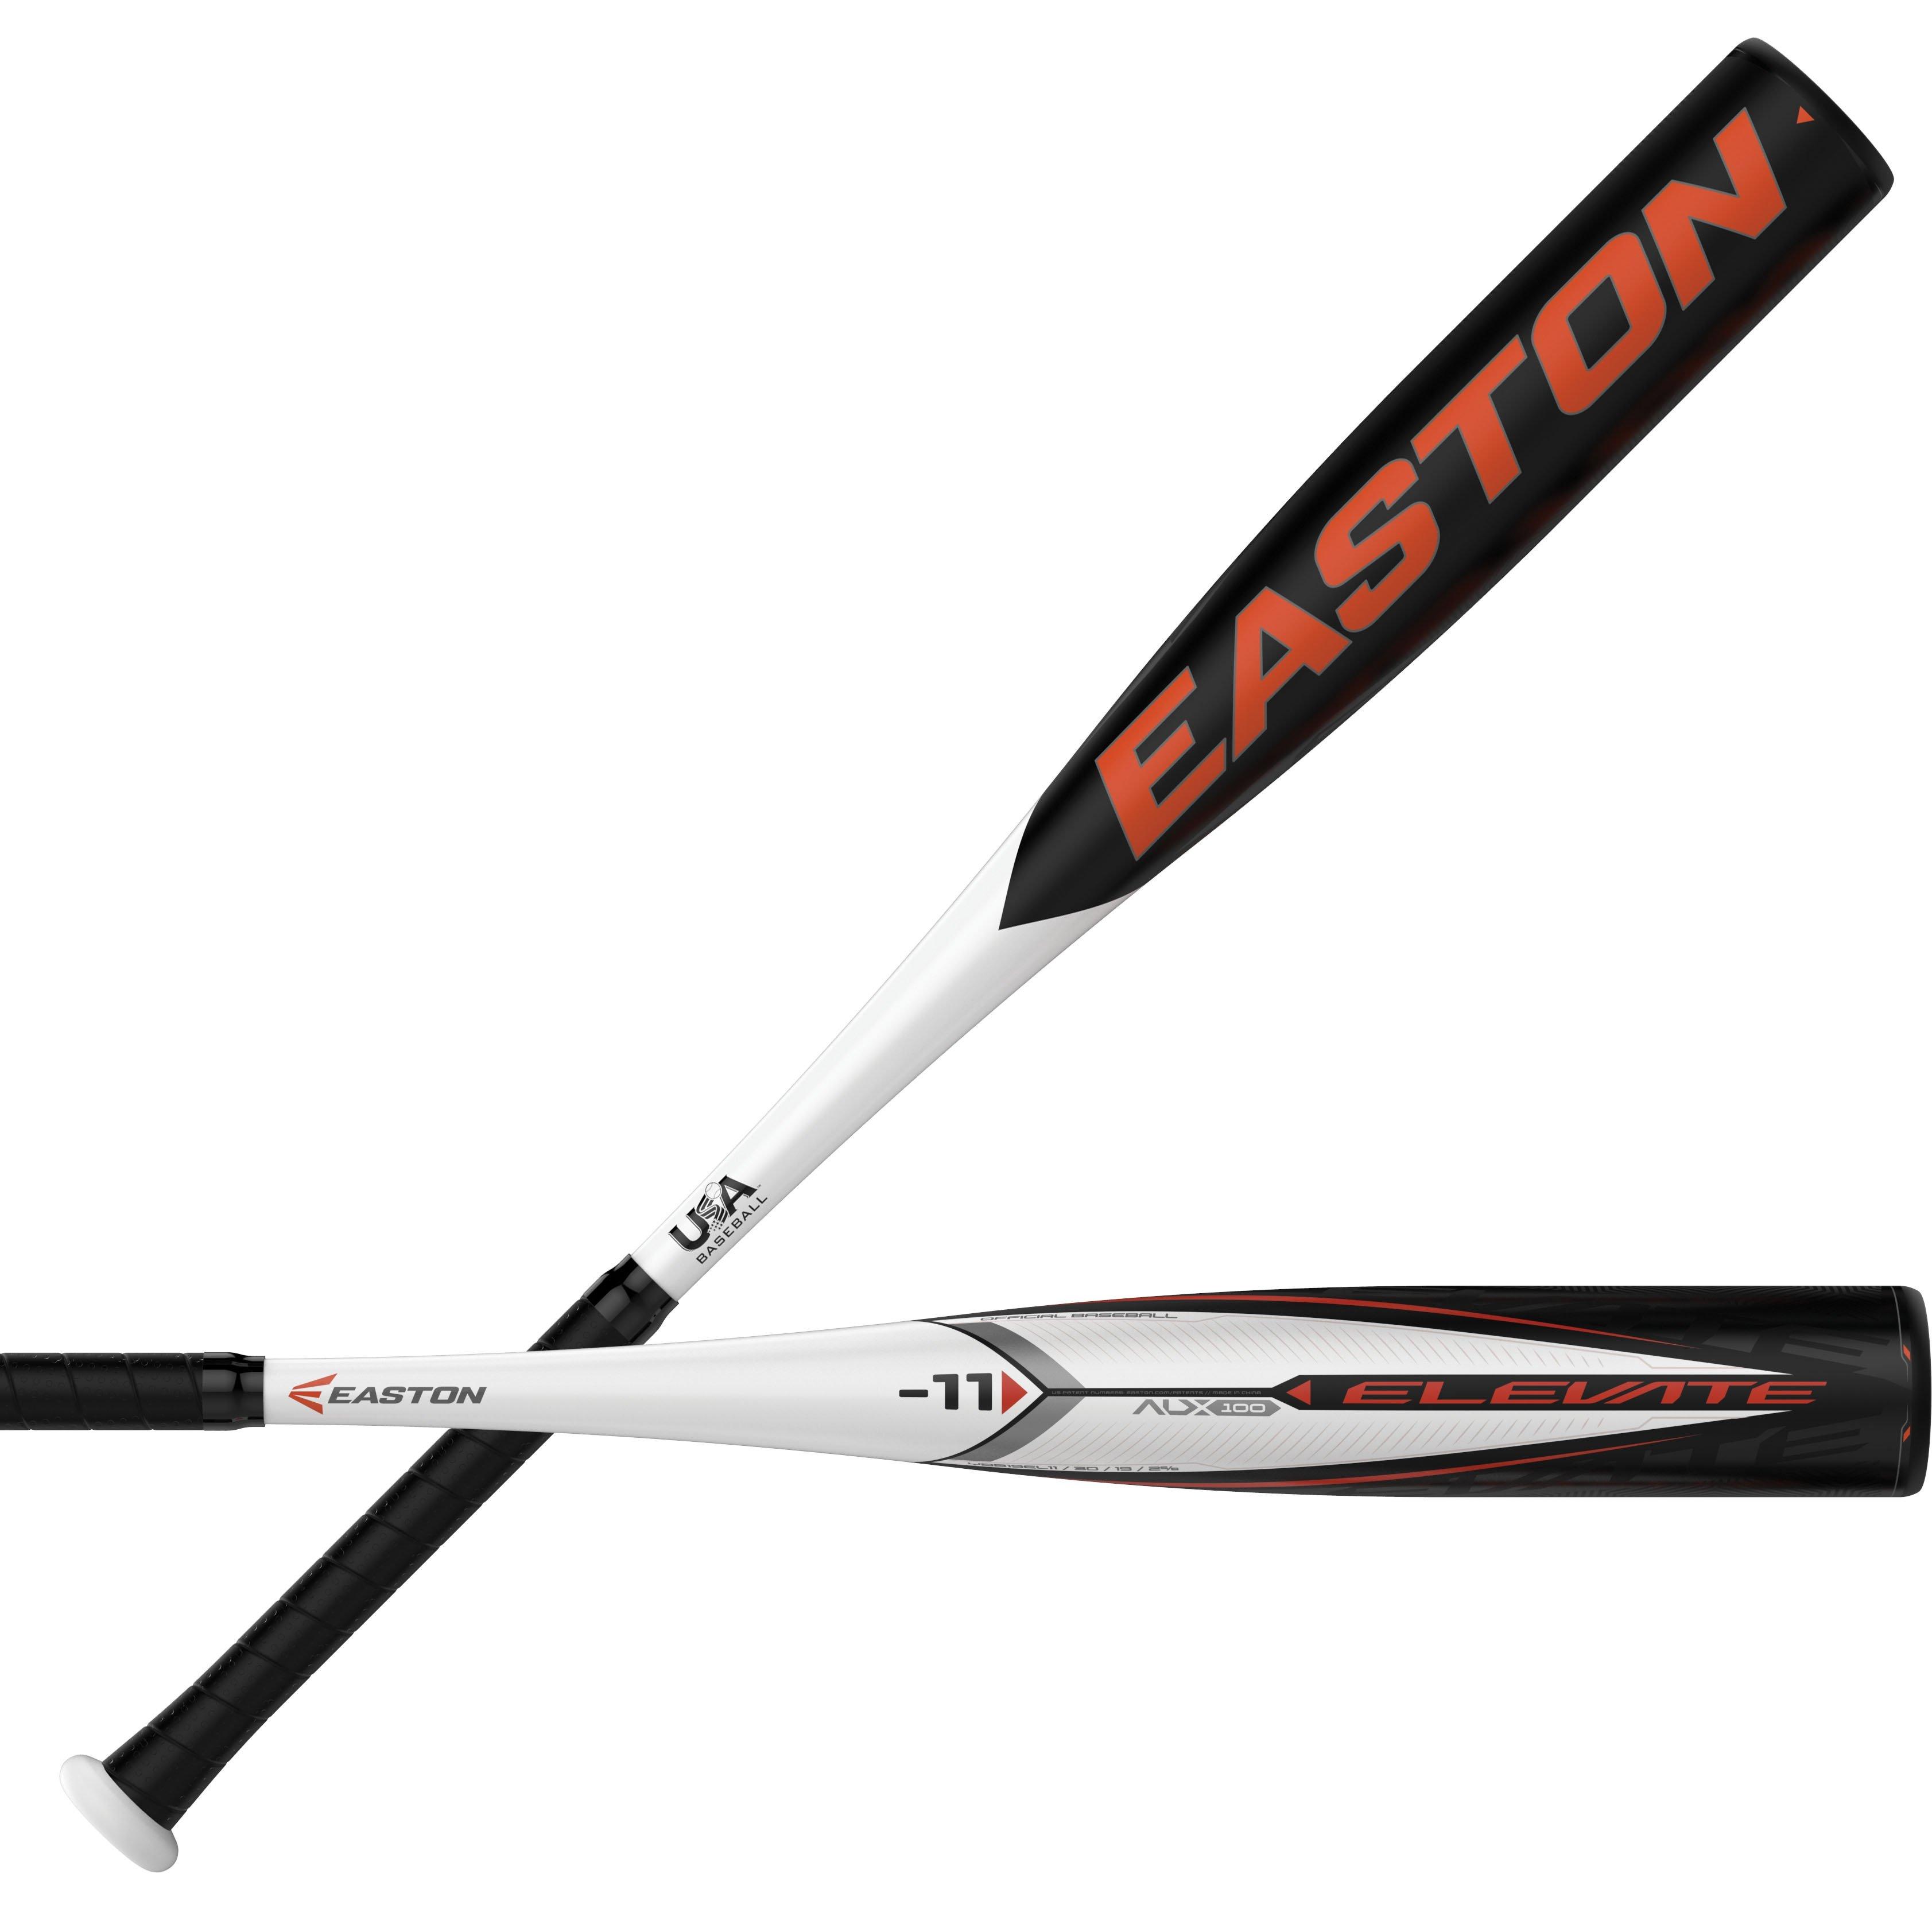 3 Easton Elevate Bbcor Baseball Bat